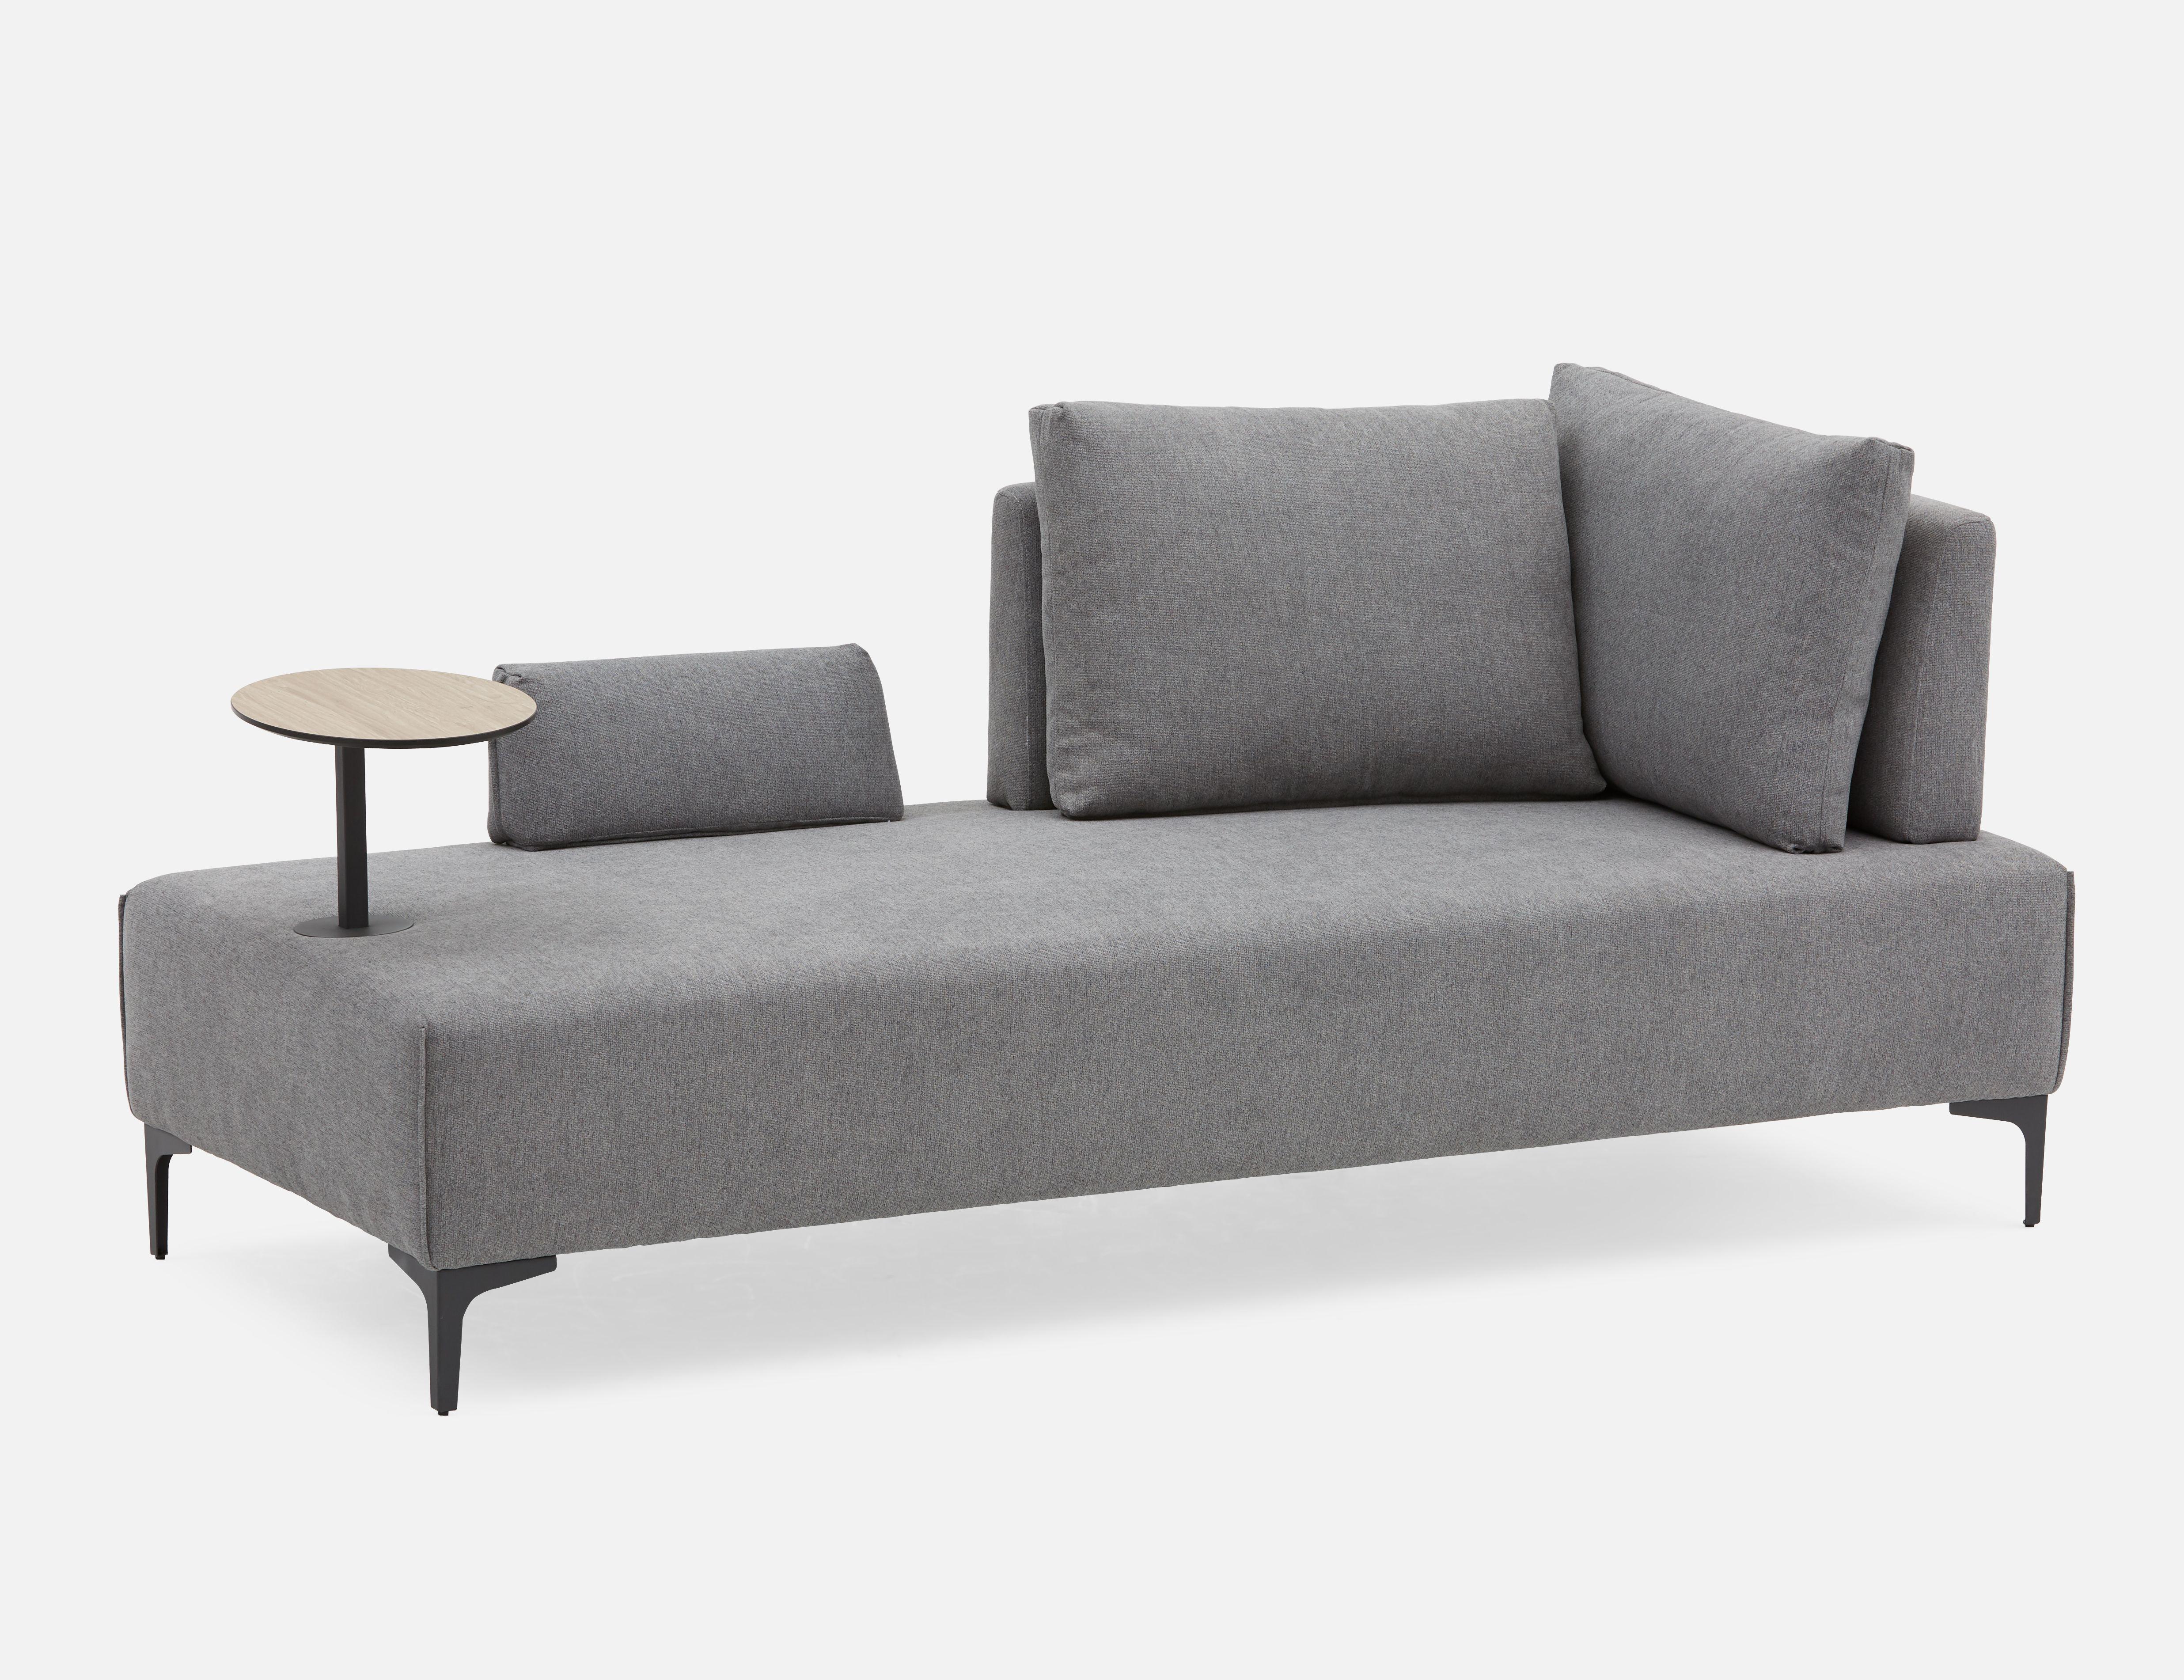 Grey Multifunctional Sofa Structube Flexi Sofa Love Seat Multifunctional